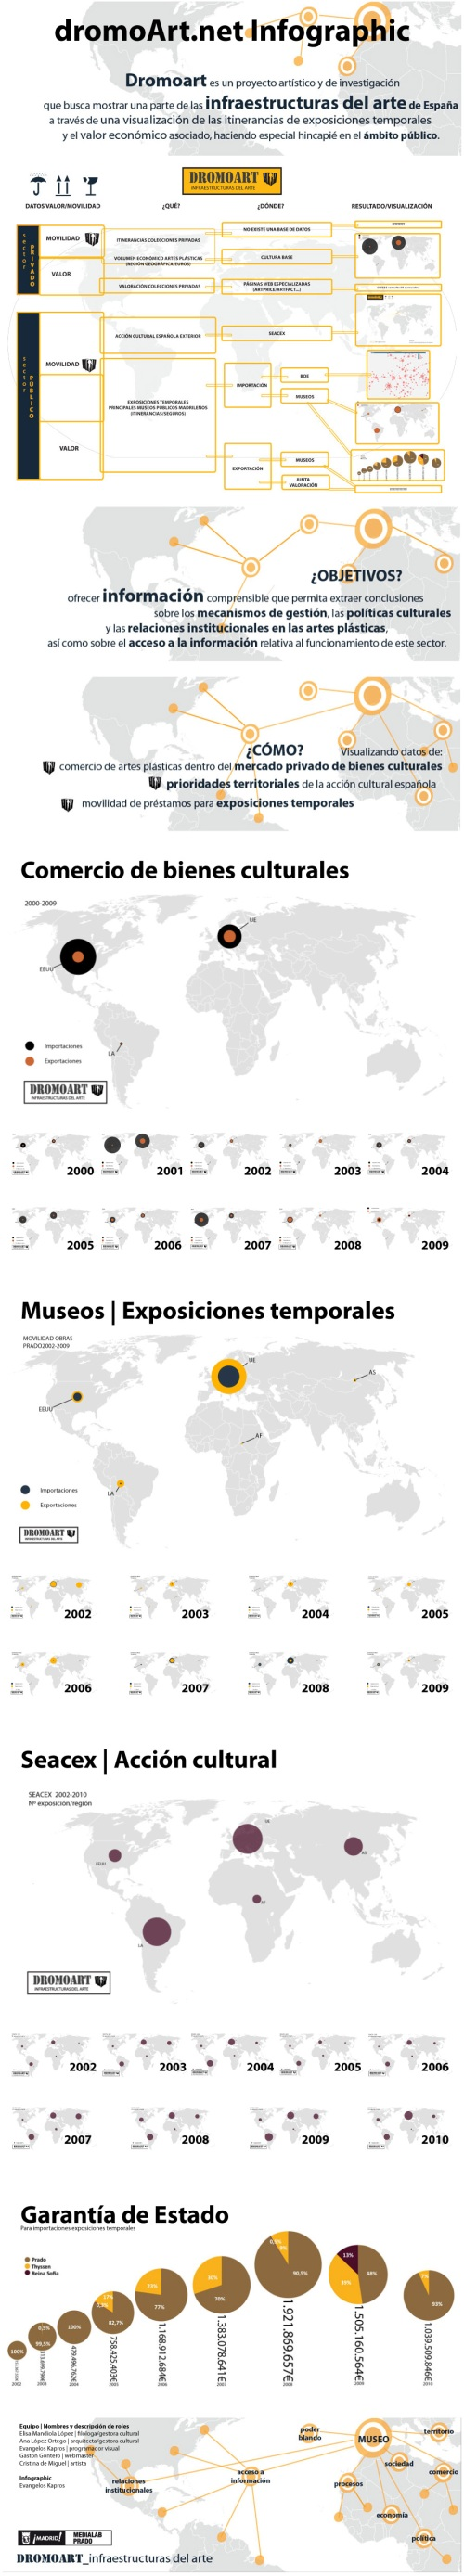 dromoart Infographic